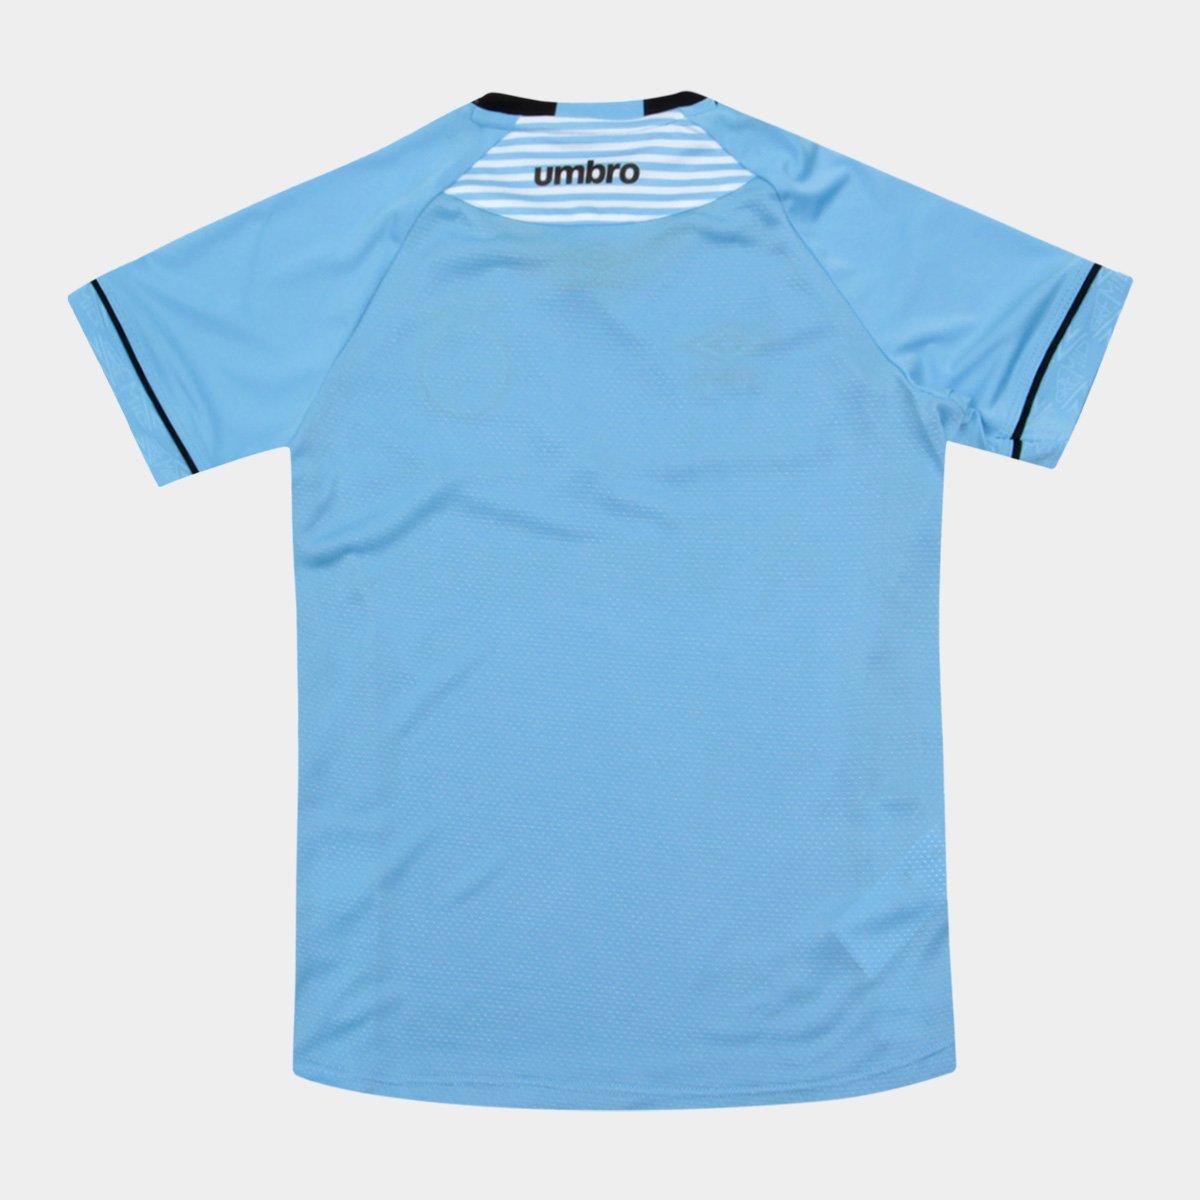 Camisa Gremio II Infantil 2018 s n° - Charrua Torcedor Umbro - Azul ... 5488336855533